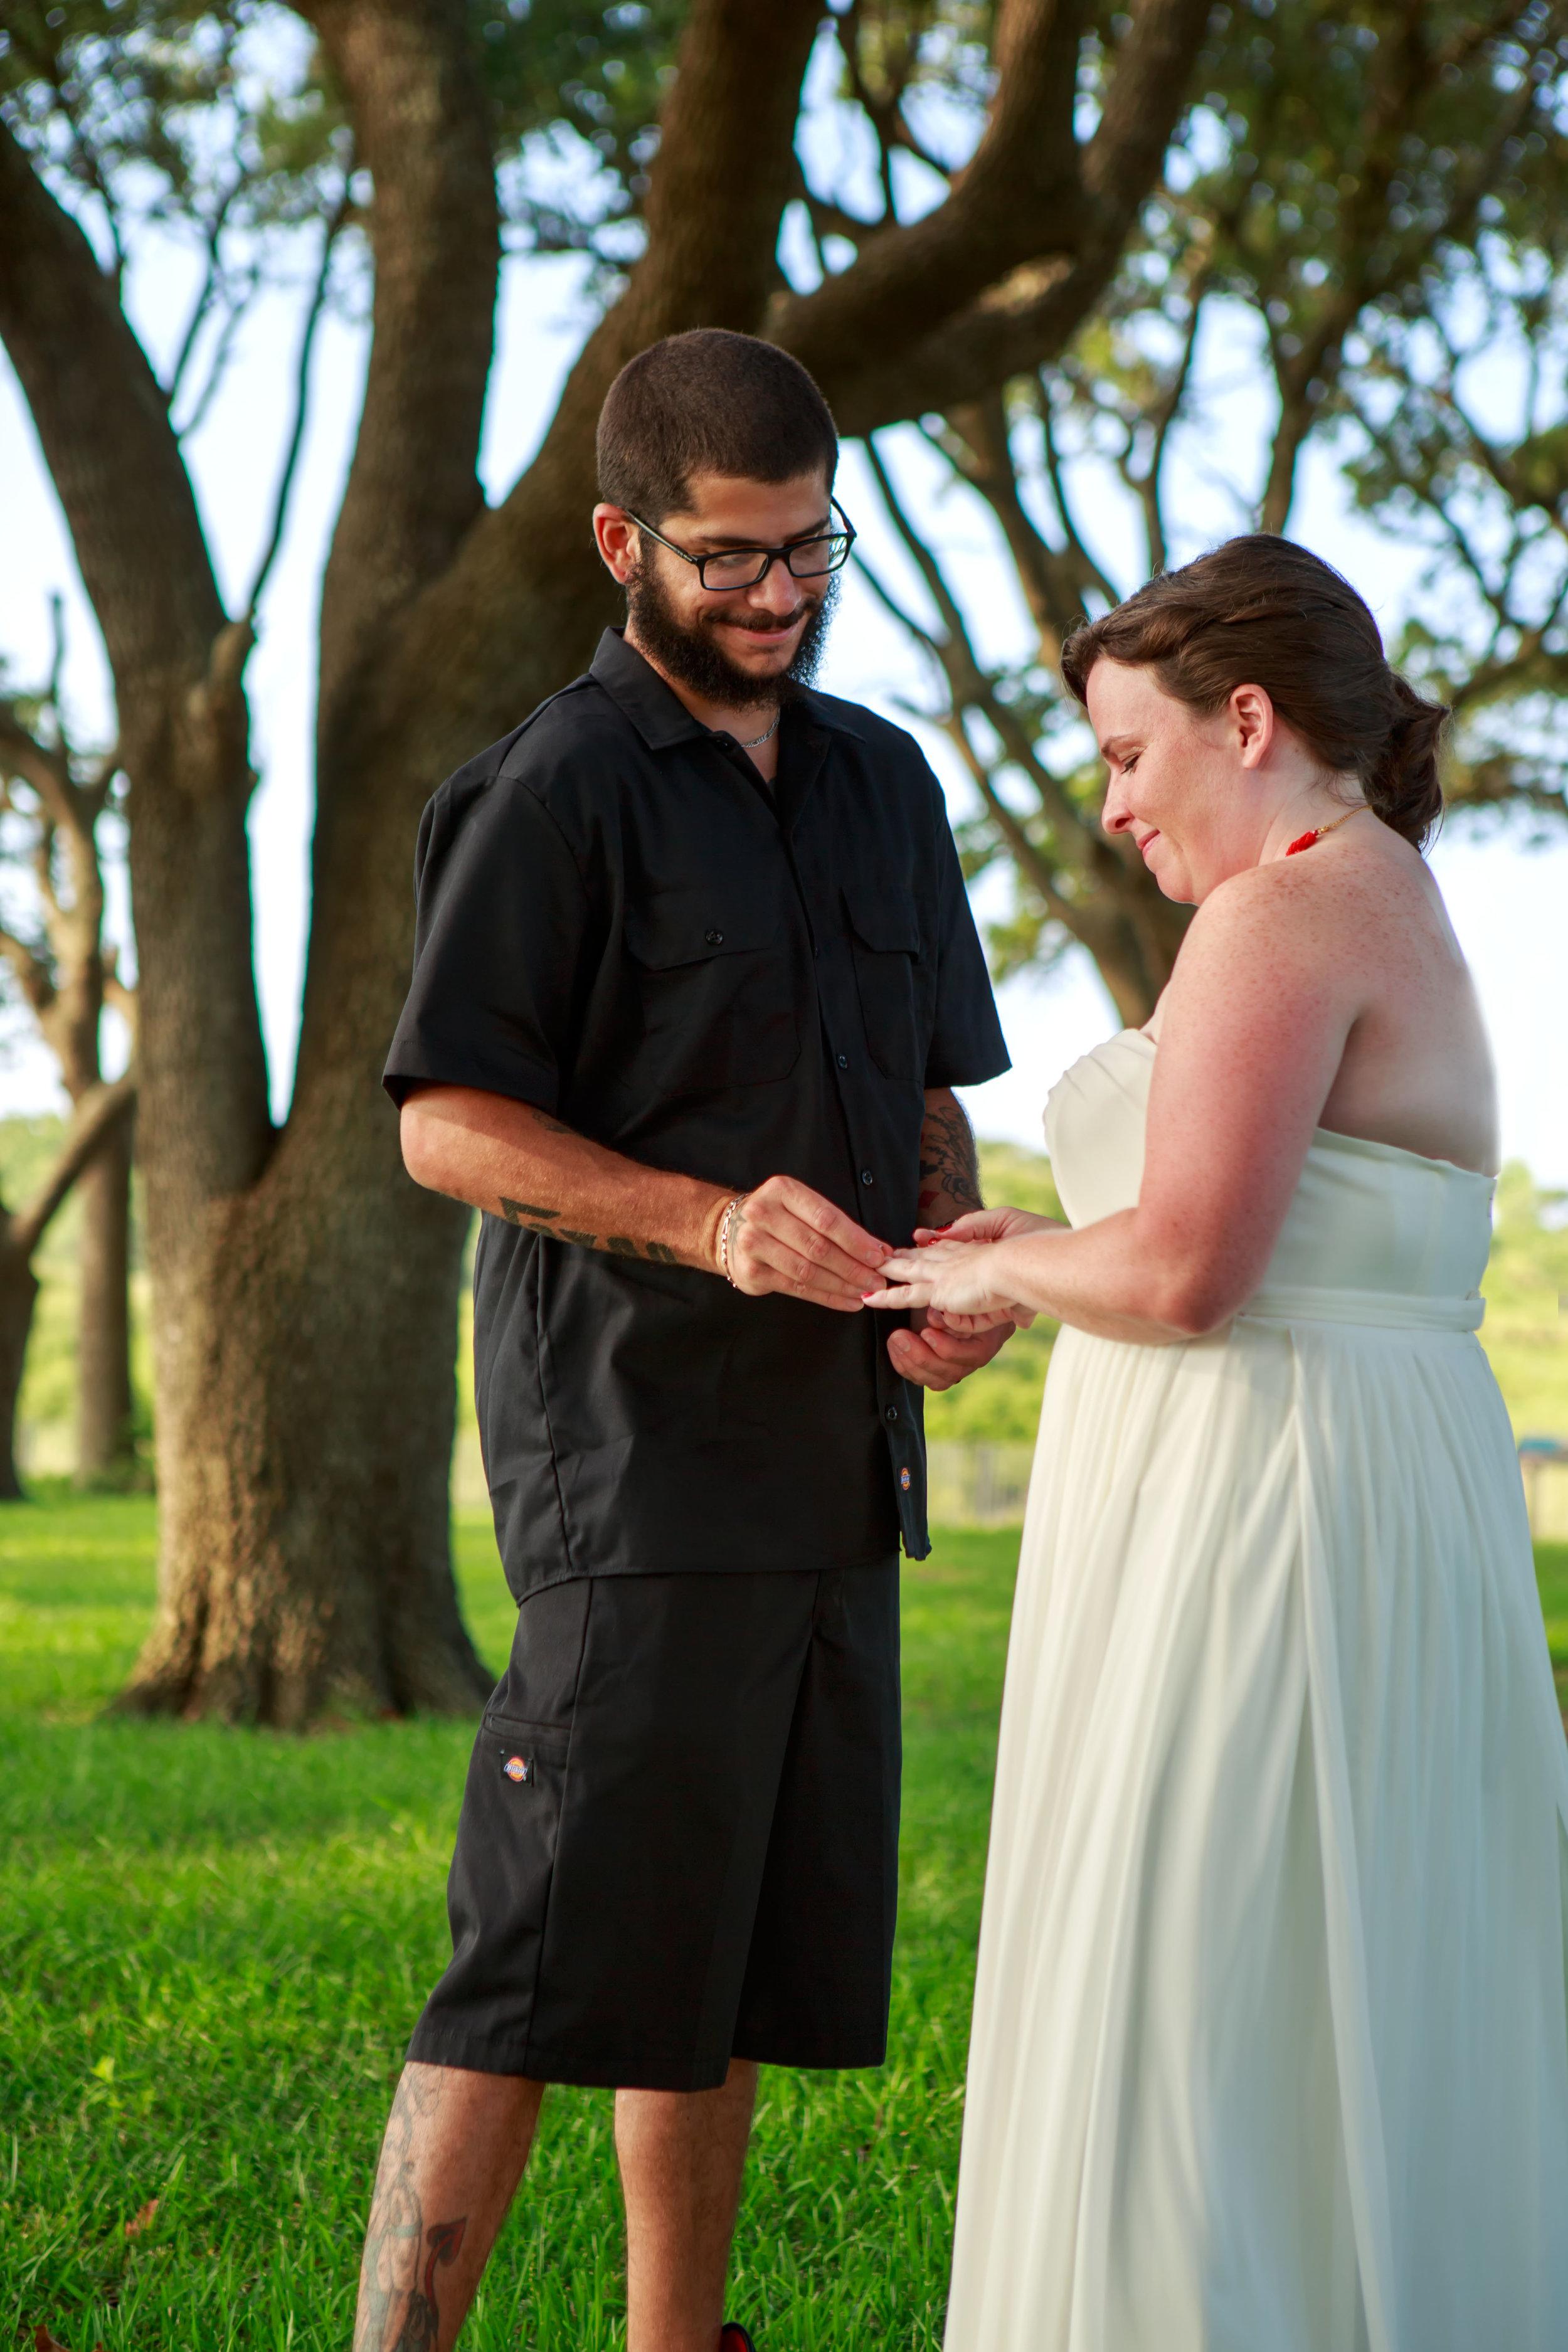 Fort_Fisher_Wedding_Photographer_Tiffany_Abruzzo_29.jpg